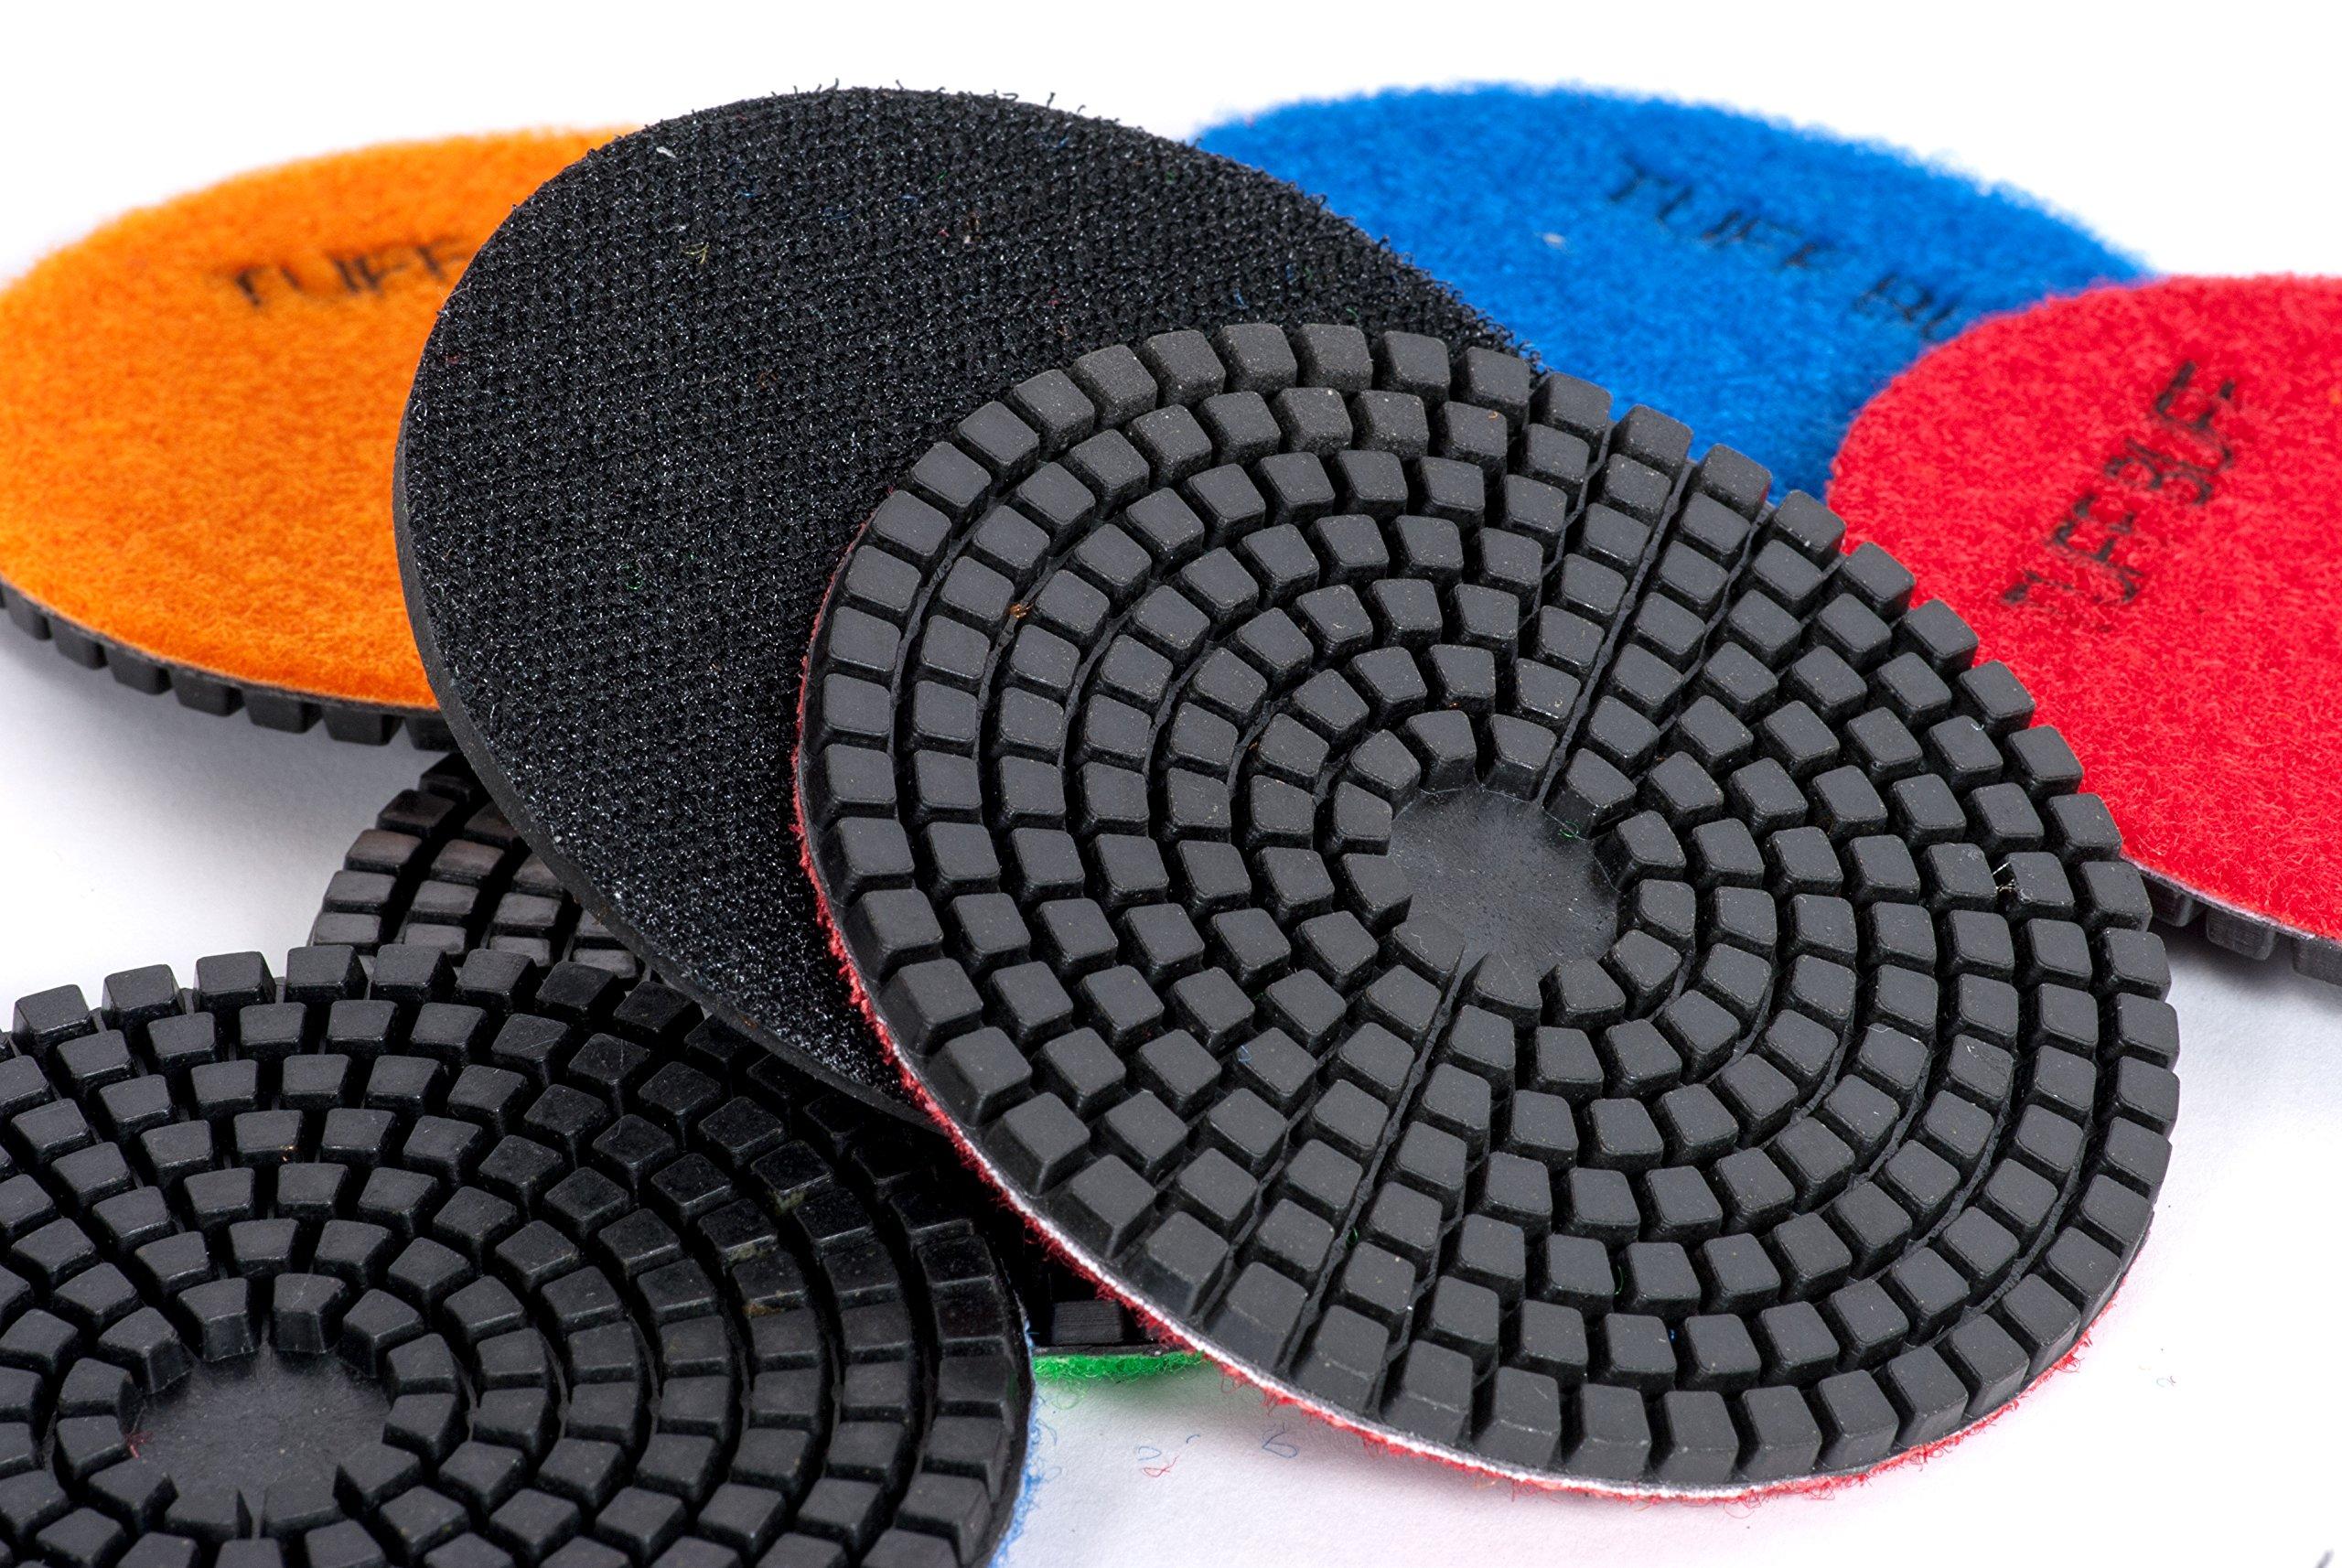 TUFF BUFF - Wet/Dry Diamond Polishing Pads - 11 Piece Set with Rubber Backer for Granite, Stone, Concrete, Marble, Travertine, Terrazzo- 4'' Inch Pads by Tuff Buff (Image #5)